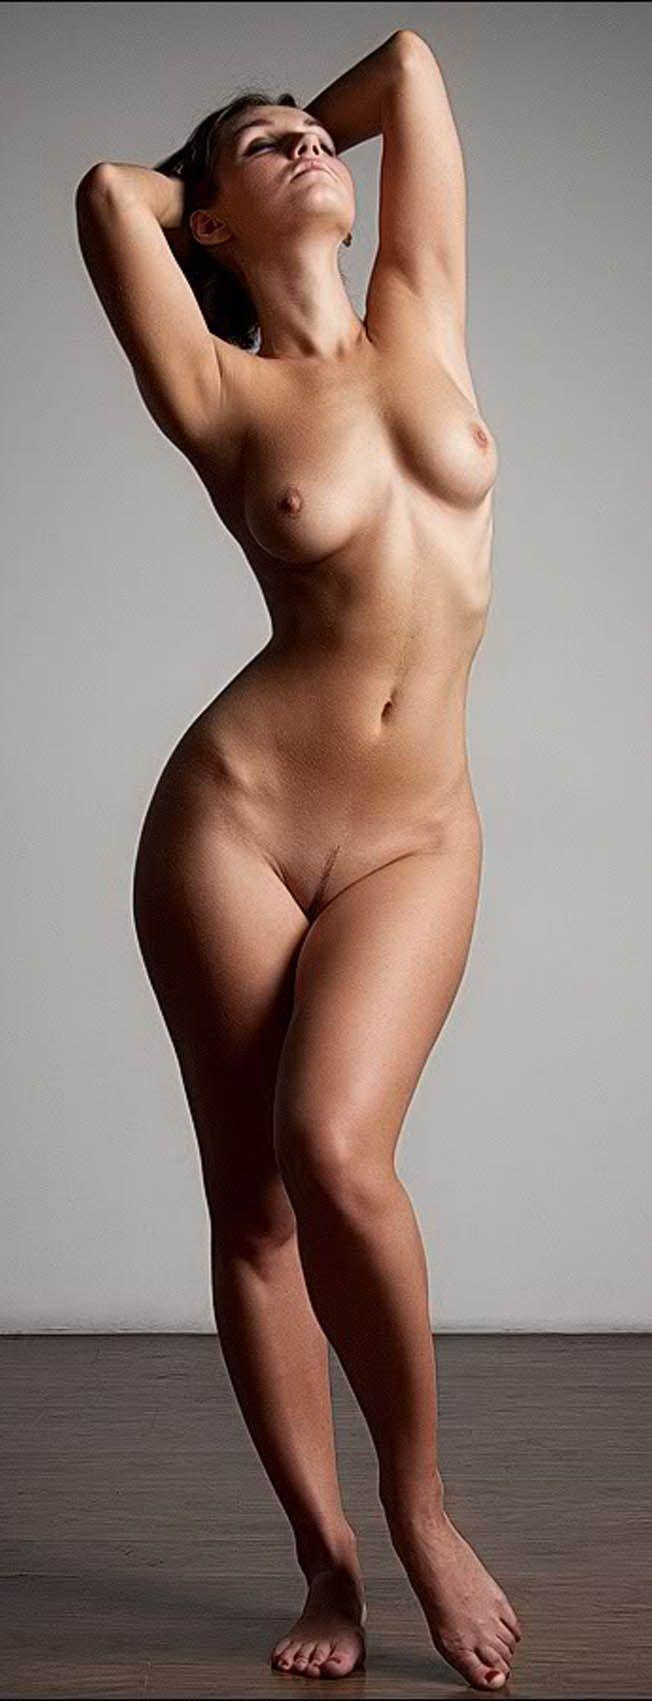 LOVE Fucking nude art poses